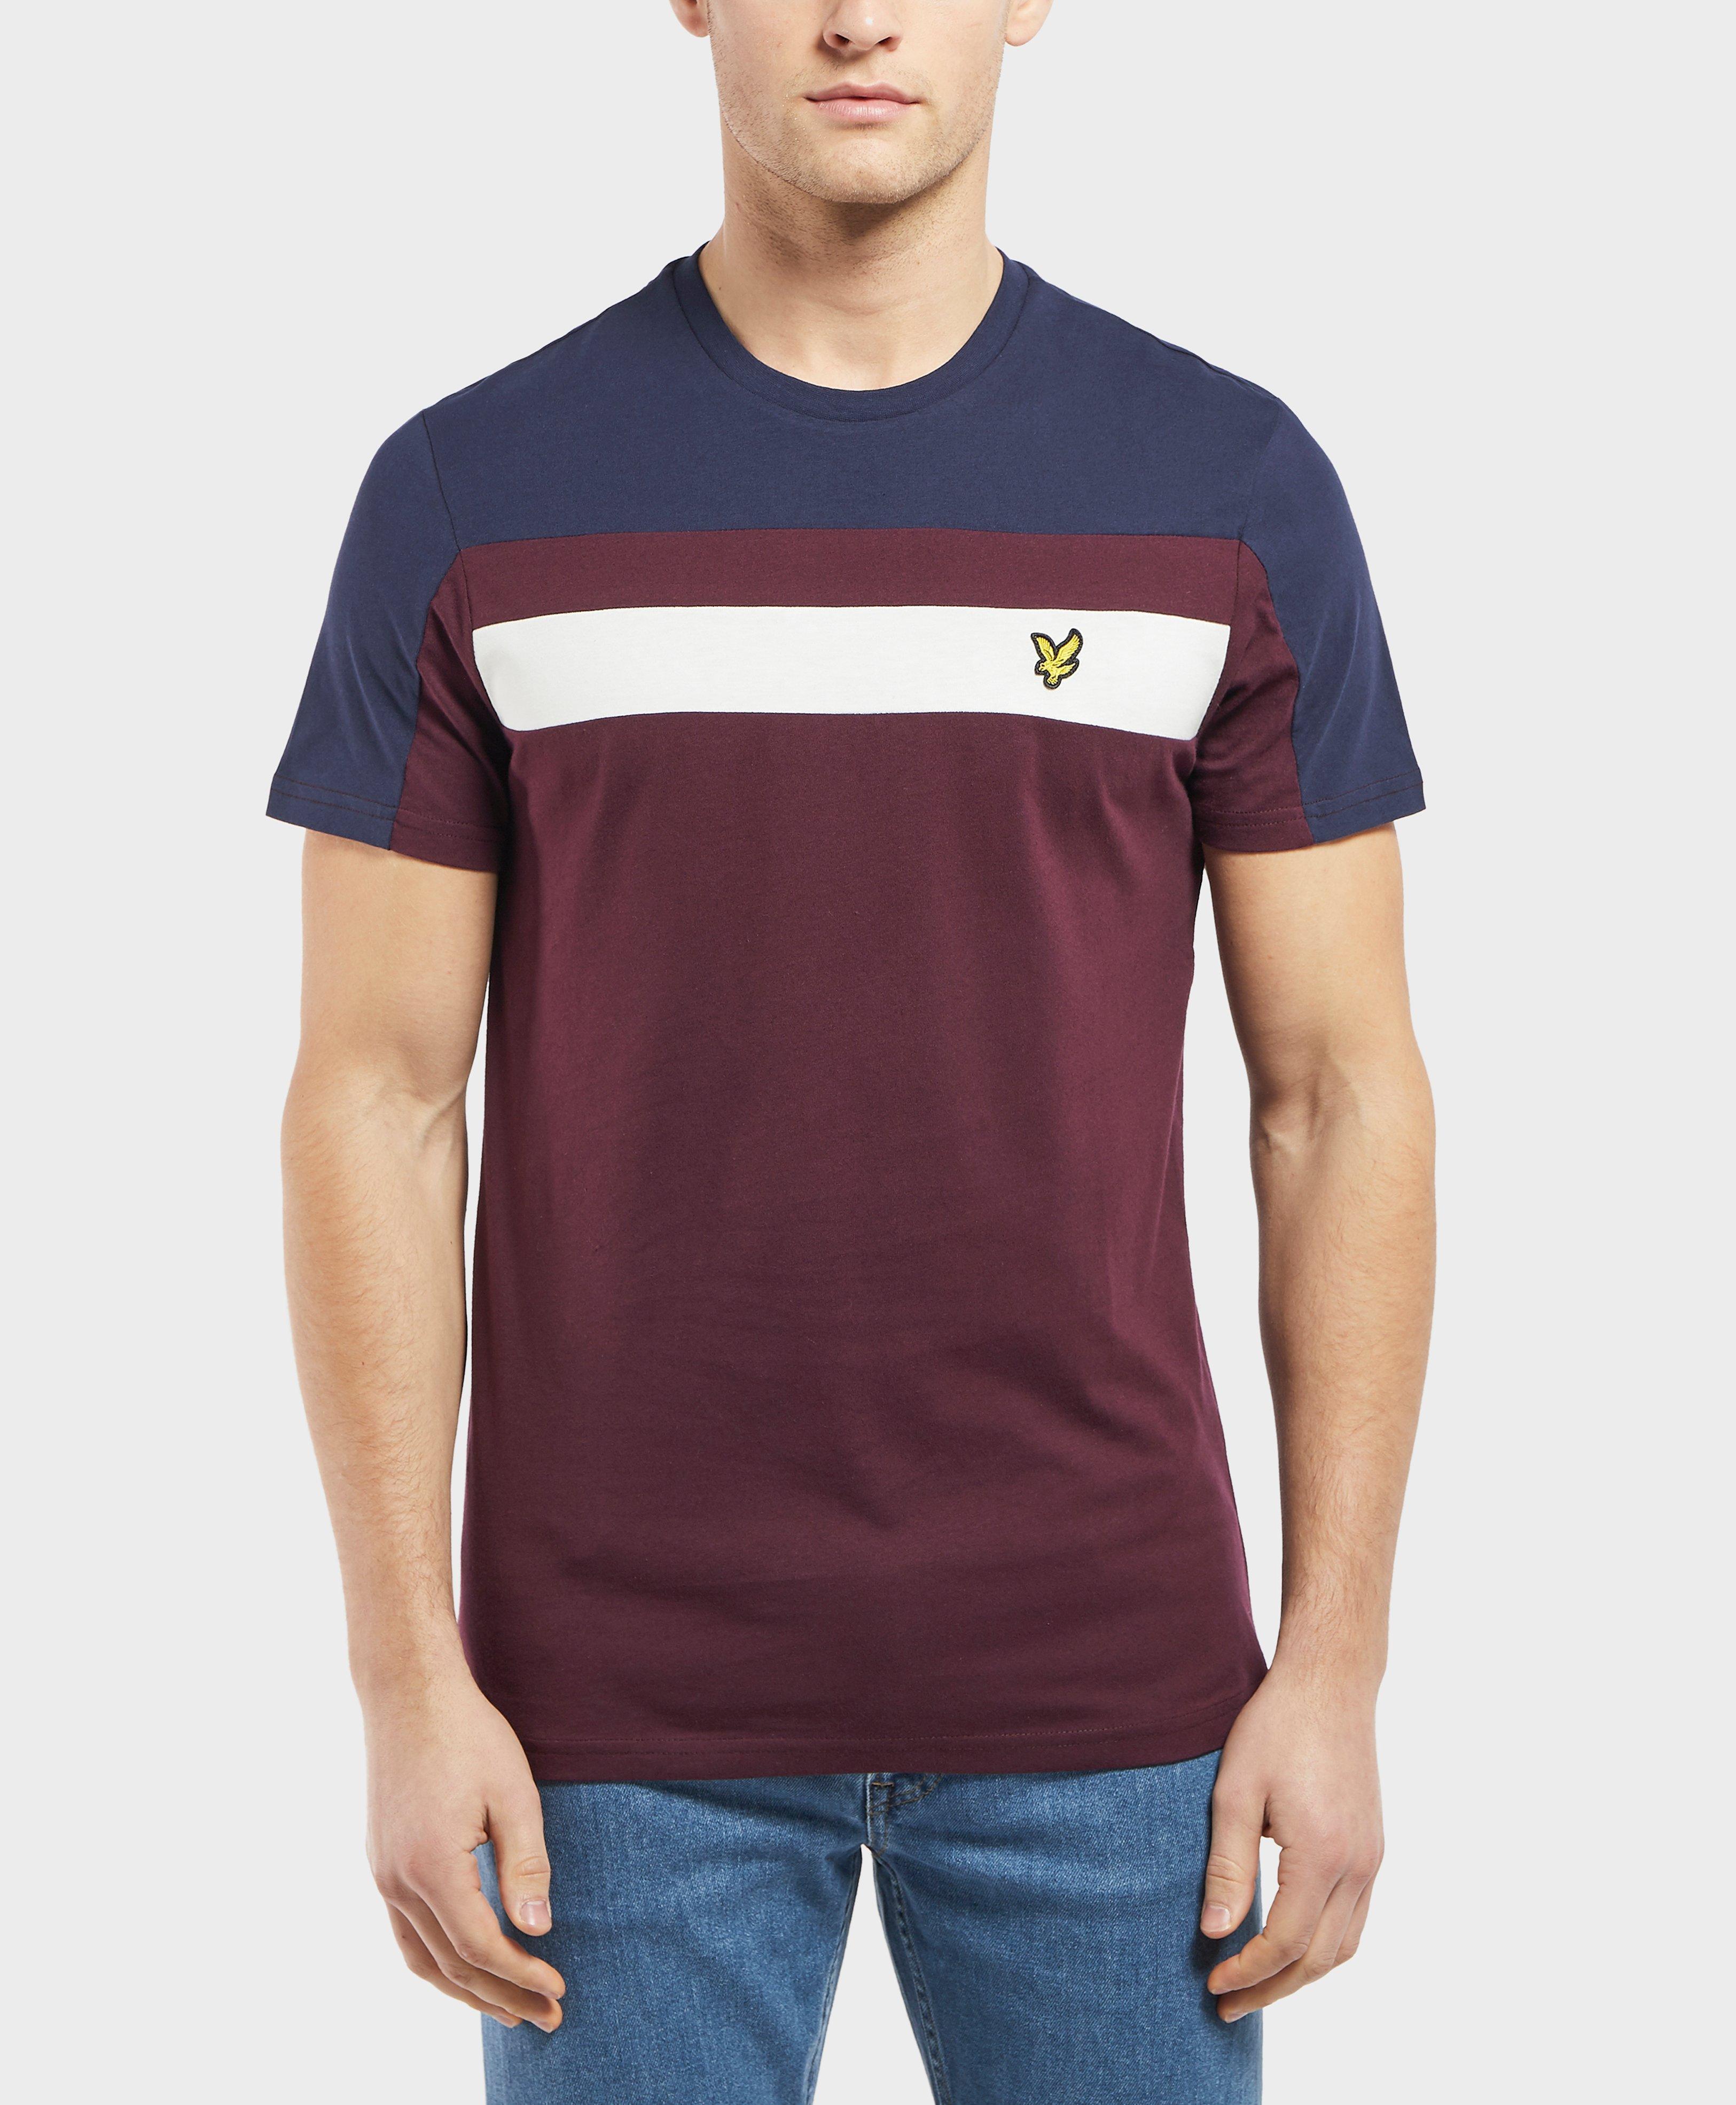 0f1816396 Lyst - Lyle & Scott Short Sleeve Colour Block T-shirt in Blue for Men